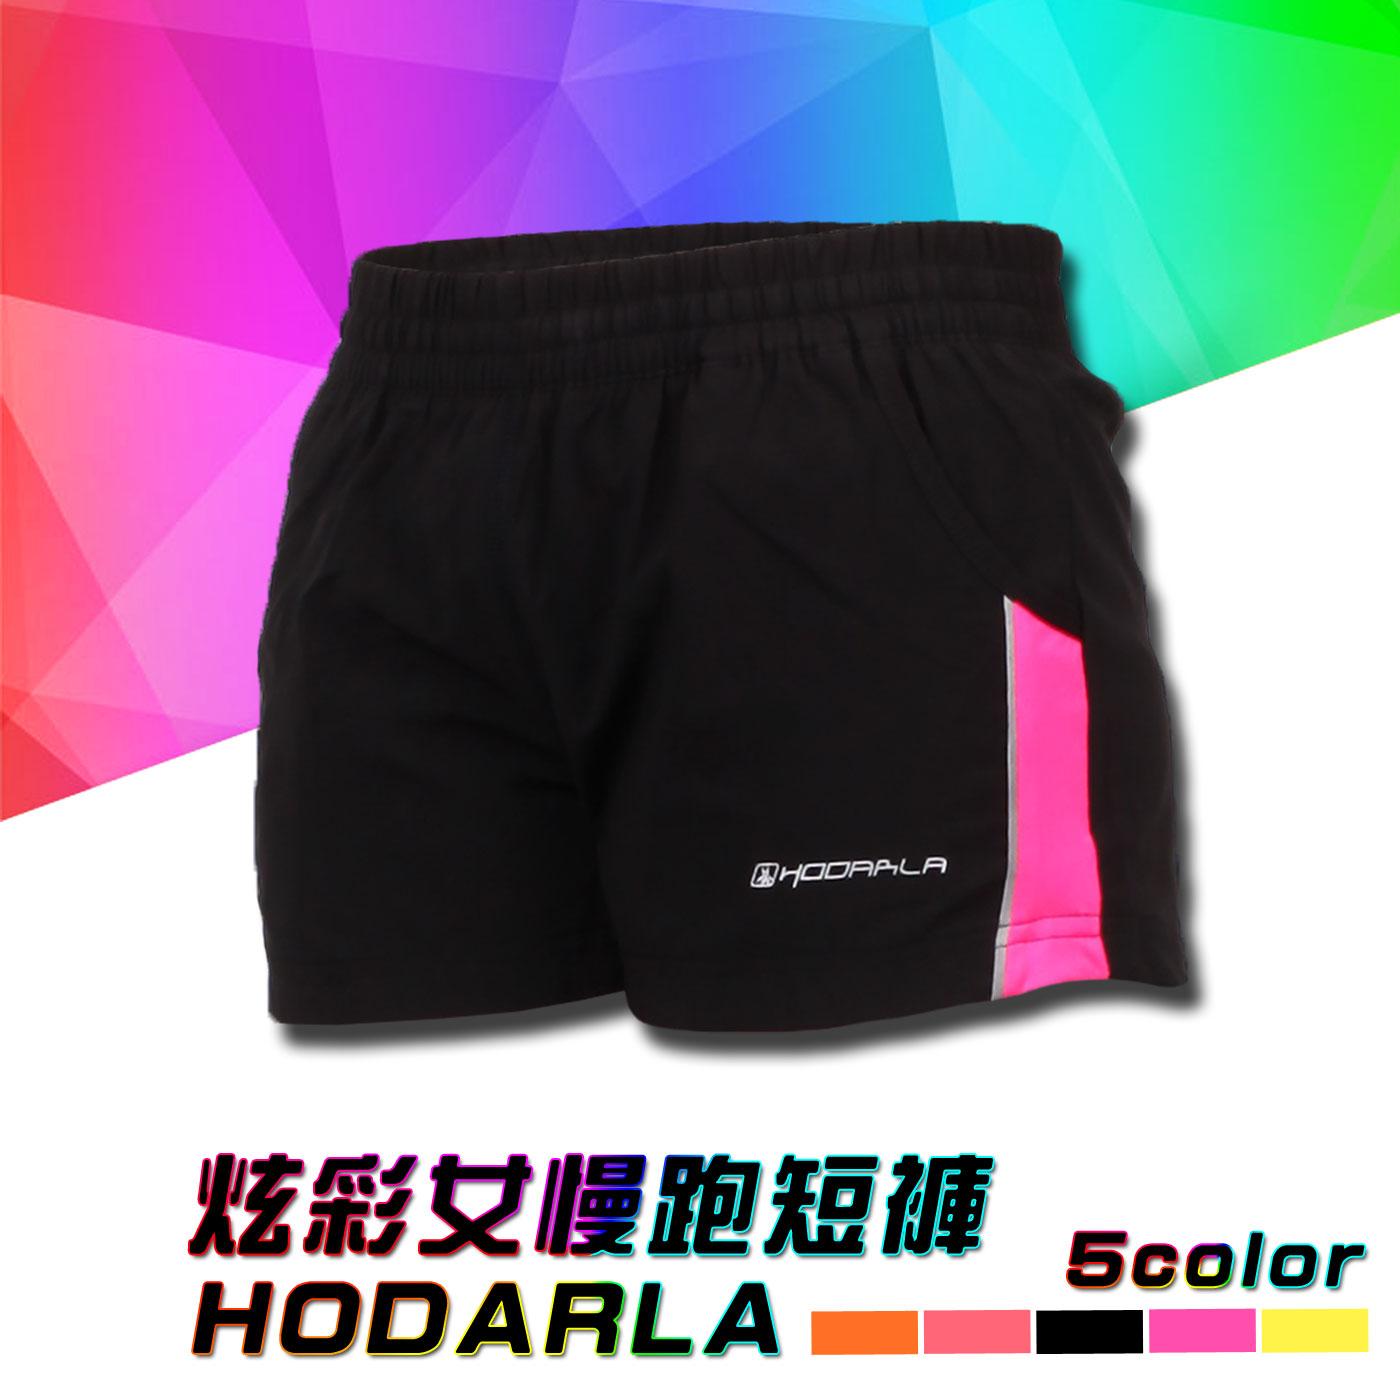 HODARLA 炫彩女慢跑短褲 3117003